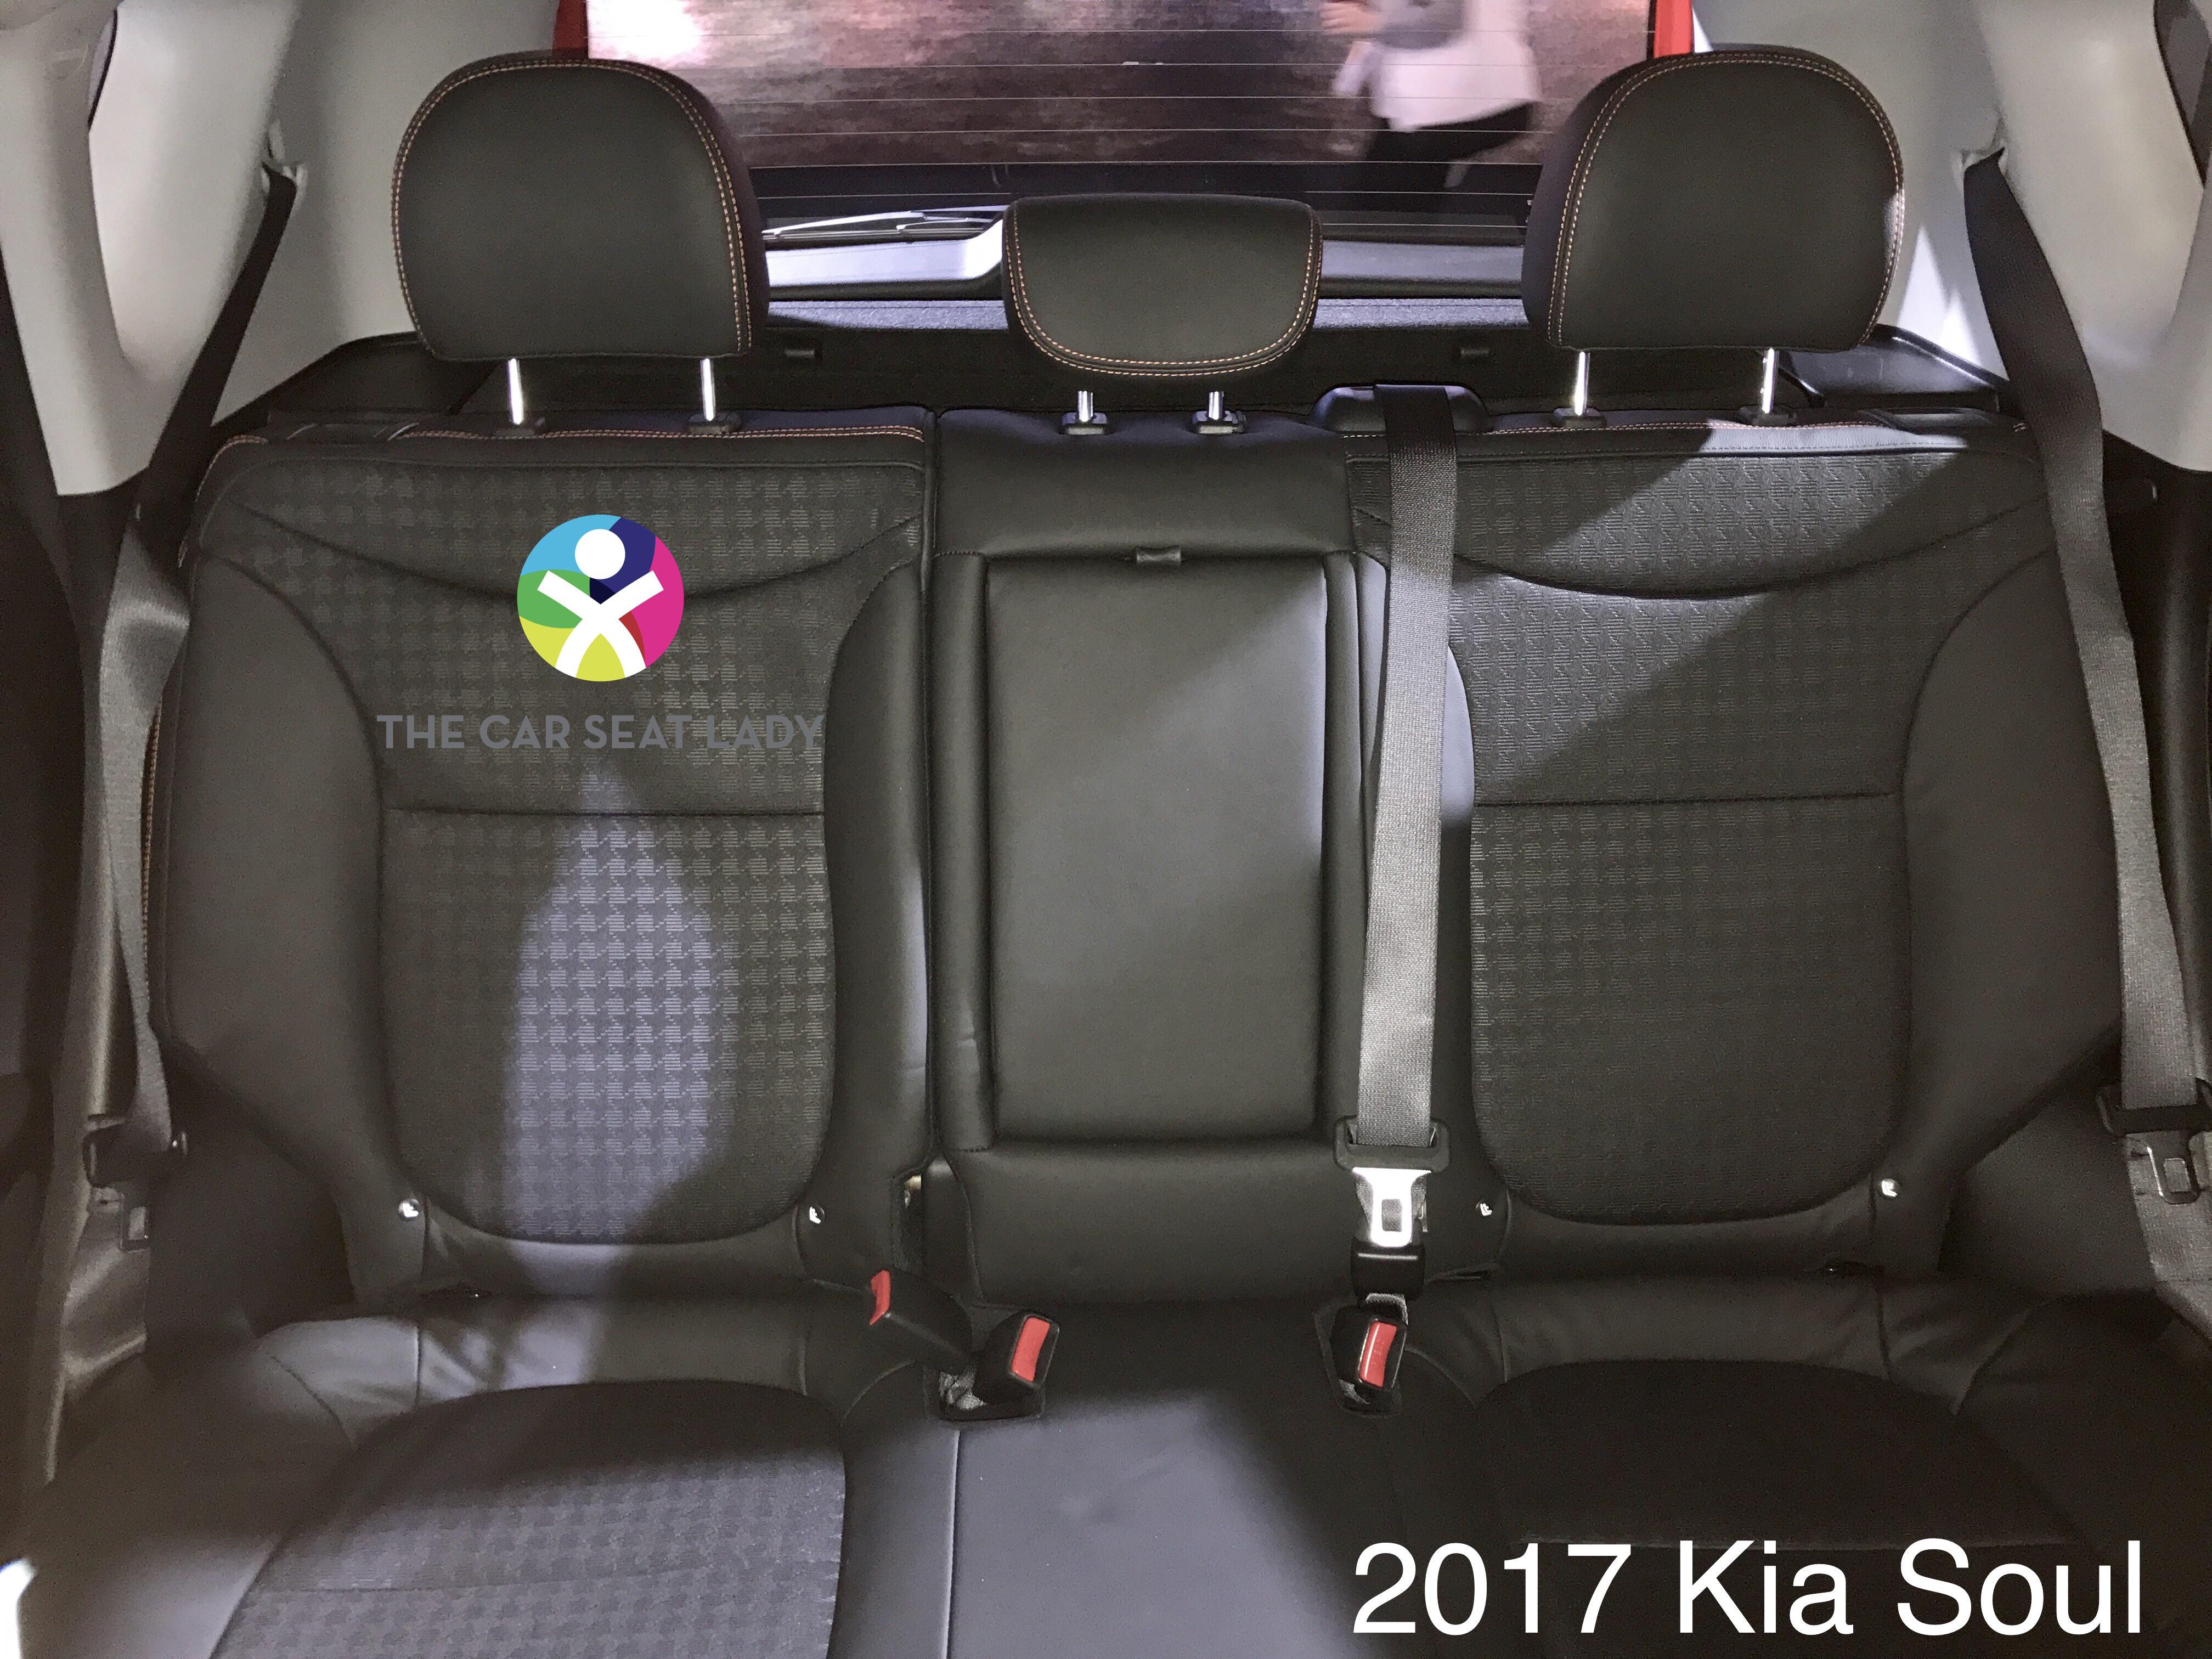 Kia Soul: Seat belt restraint system